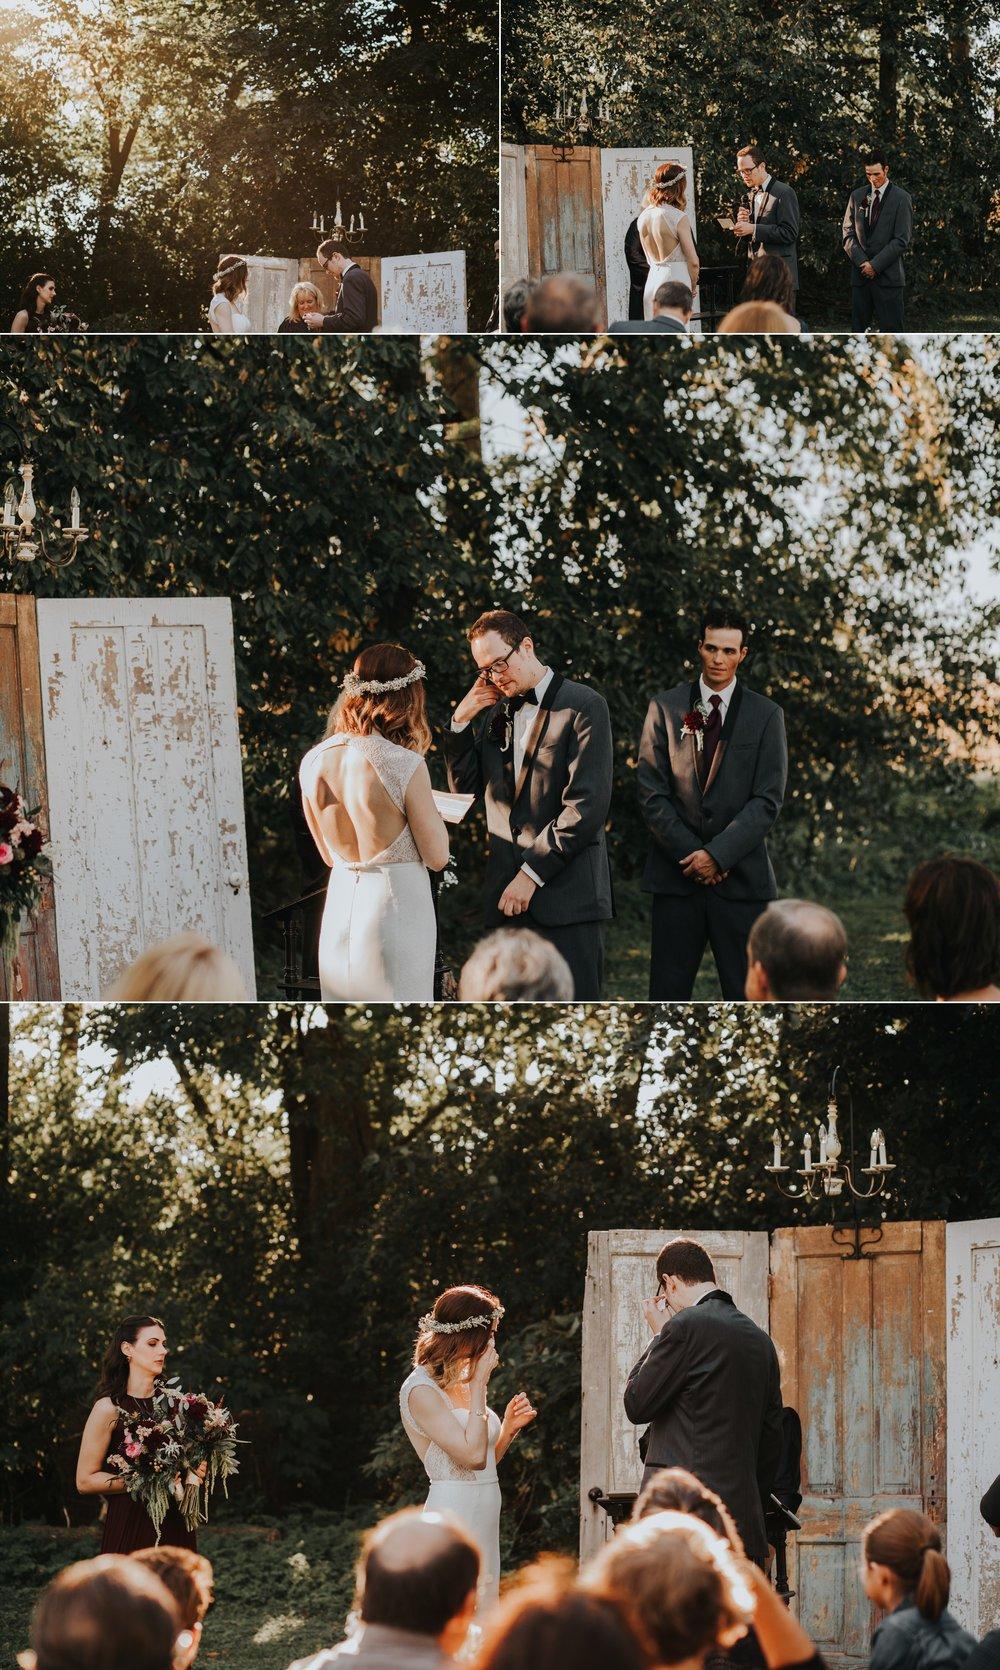 caroline and taylor minneapolis minnesota texas austin dallas houston wedding elopement destination intimate adventurous couple best photographer_0265.jpg